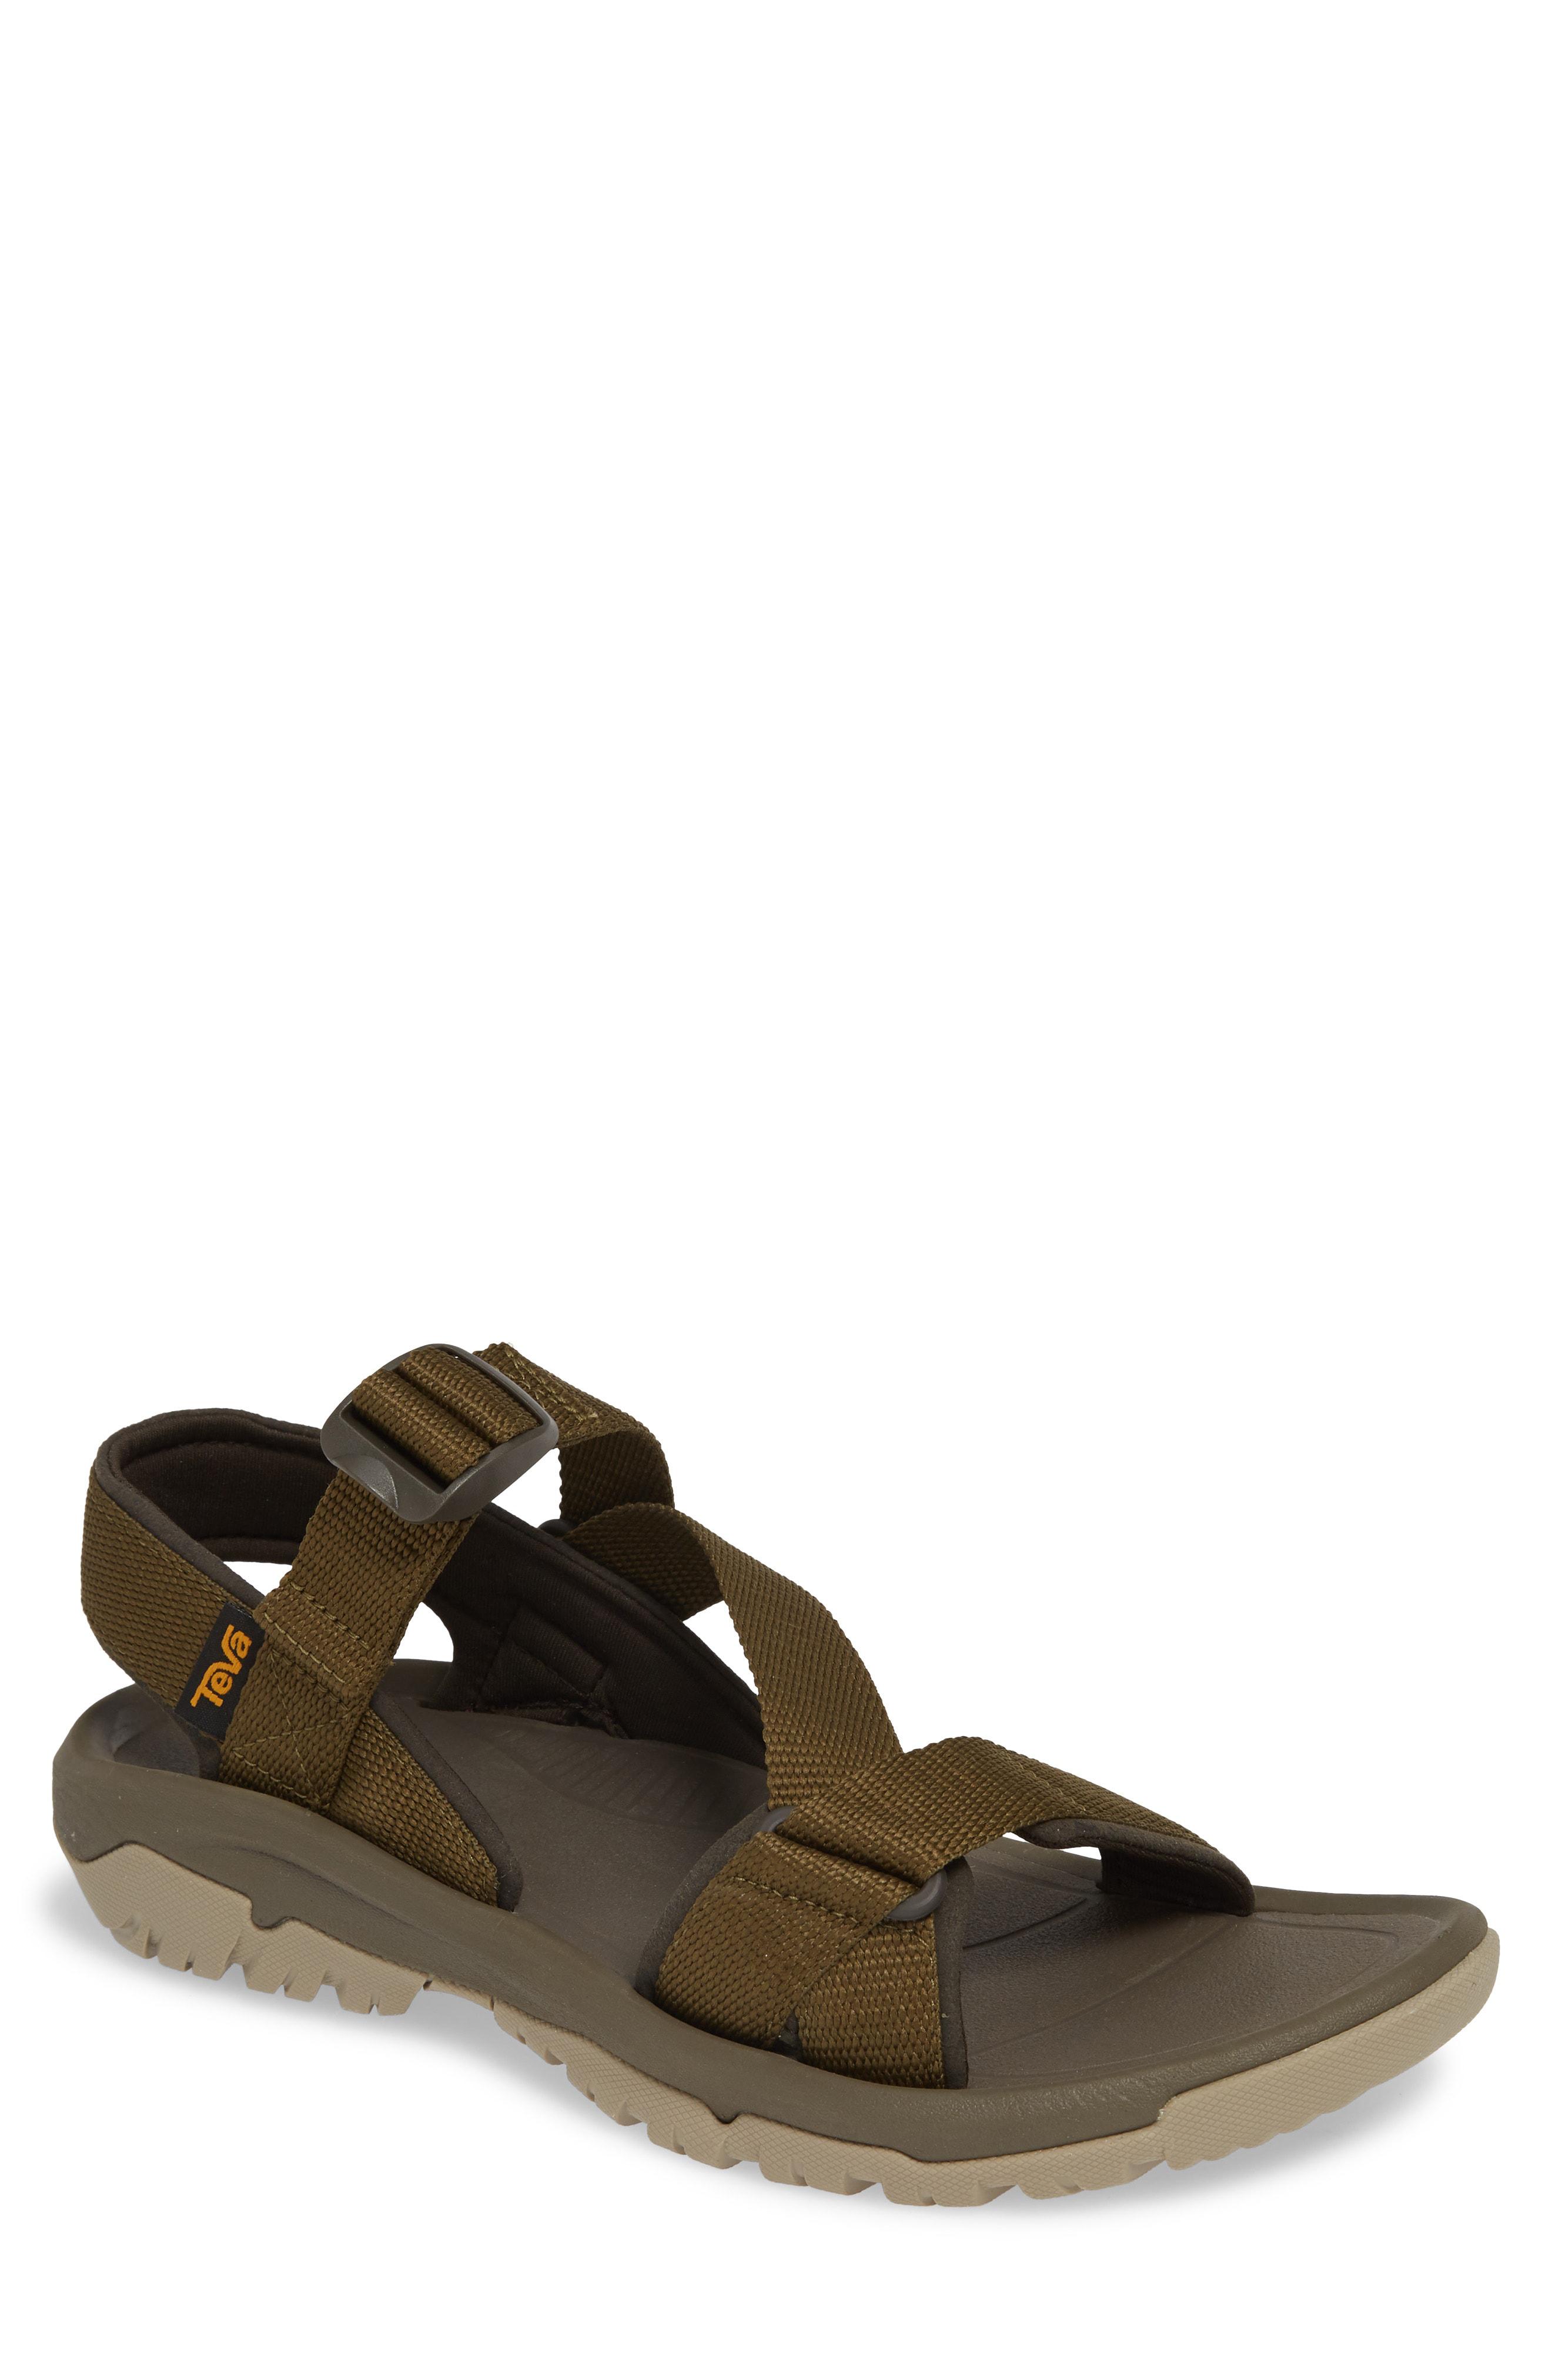 01edd99ebfd6 Teva Hurricane Xlt 2 Sandal In Dark Olive